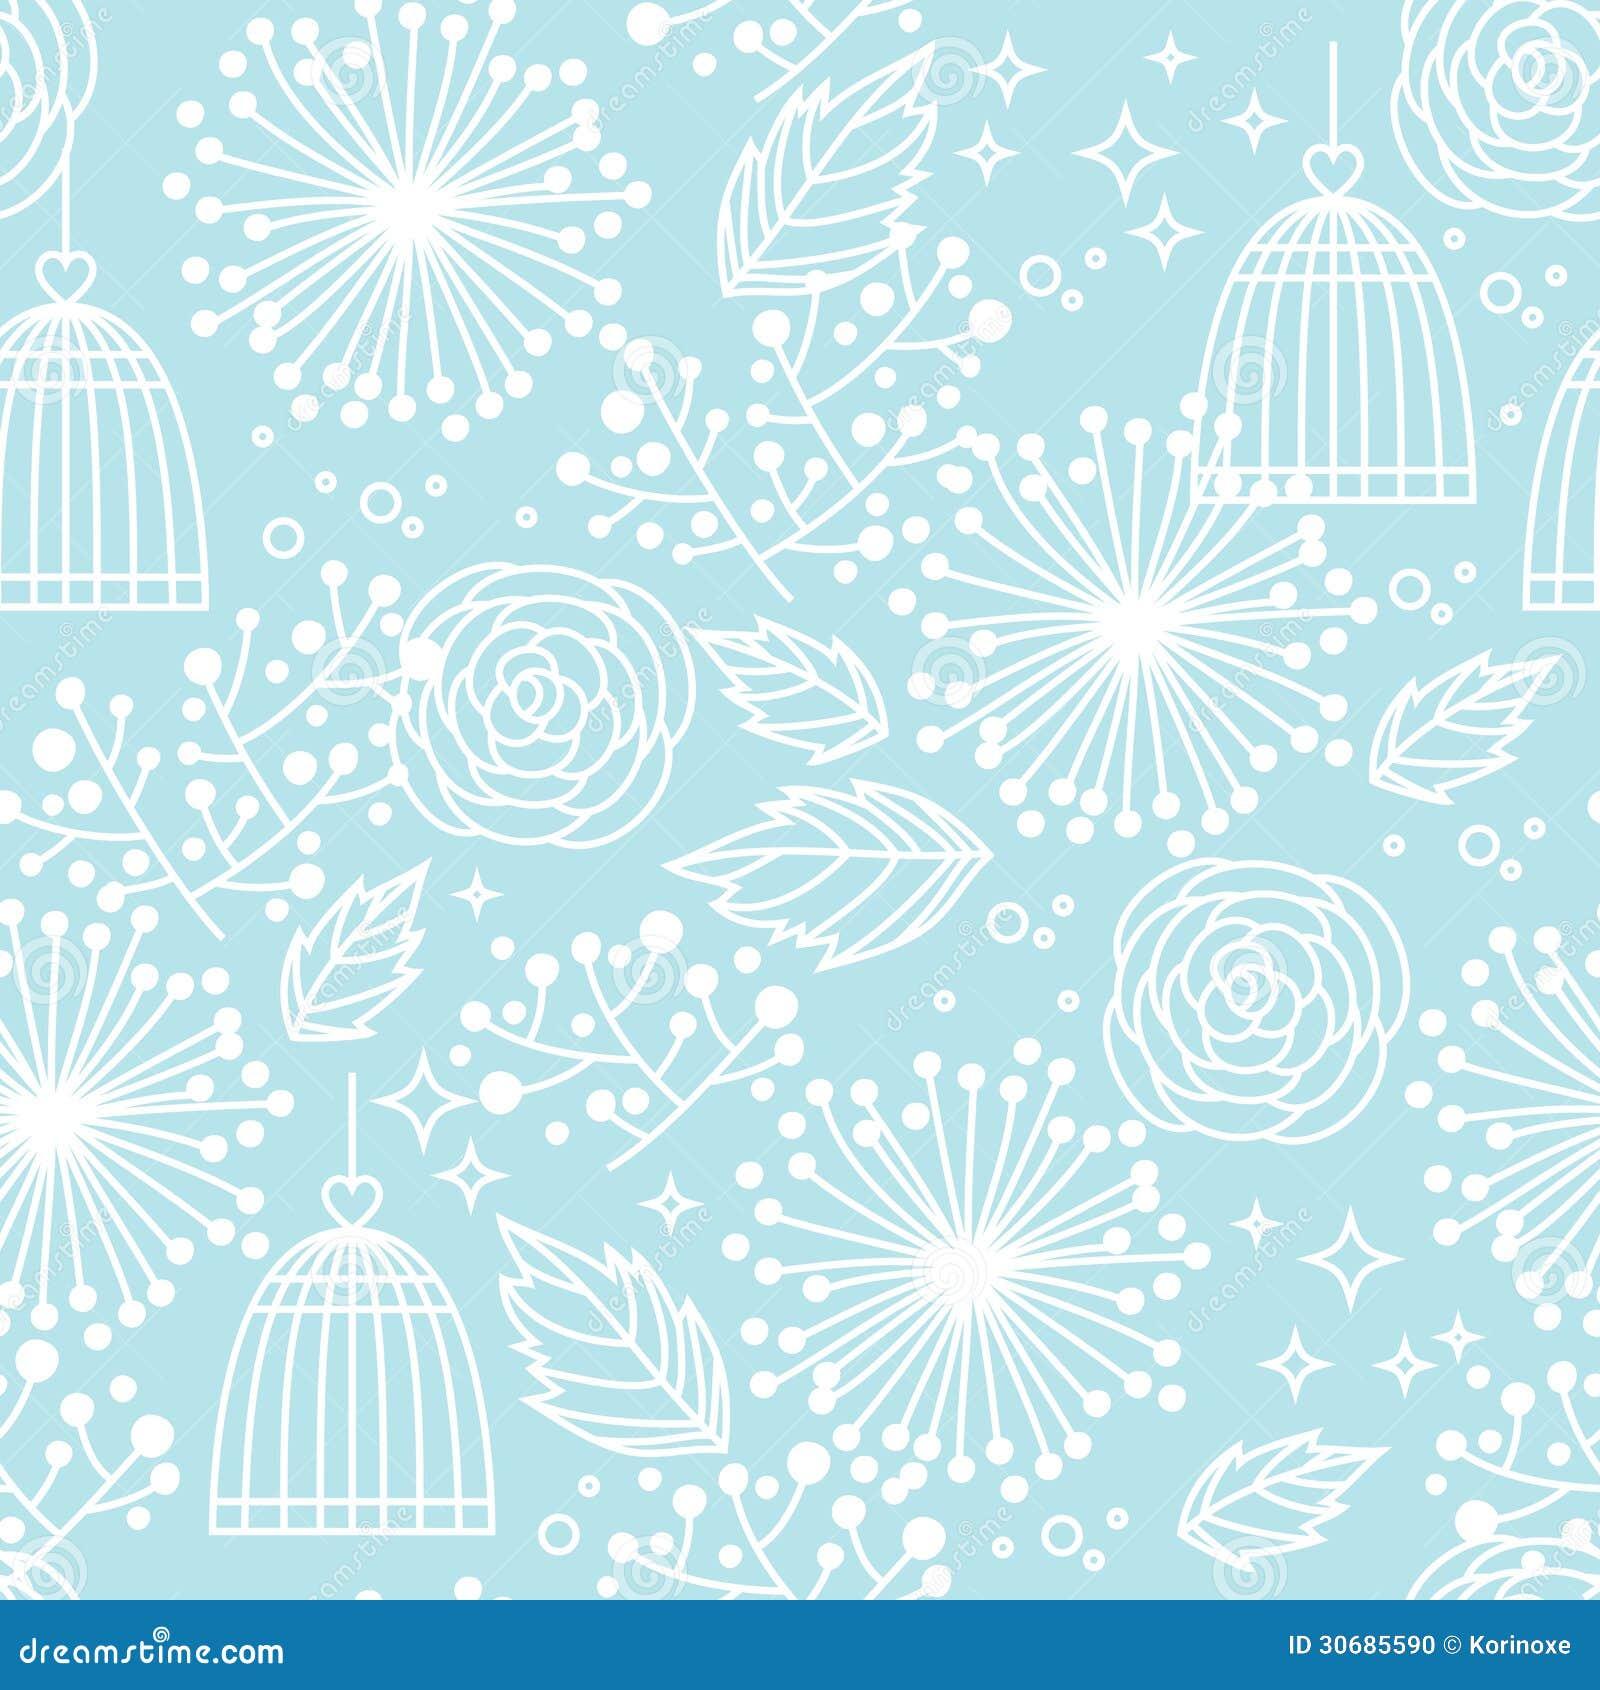 Blue Seamless Floral Pattern Stock Vector Illustration Of Design